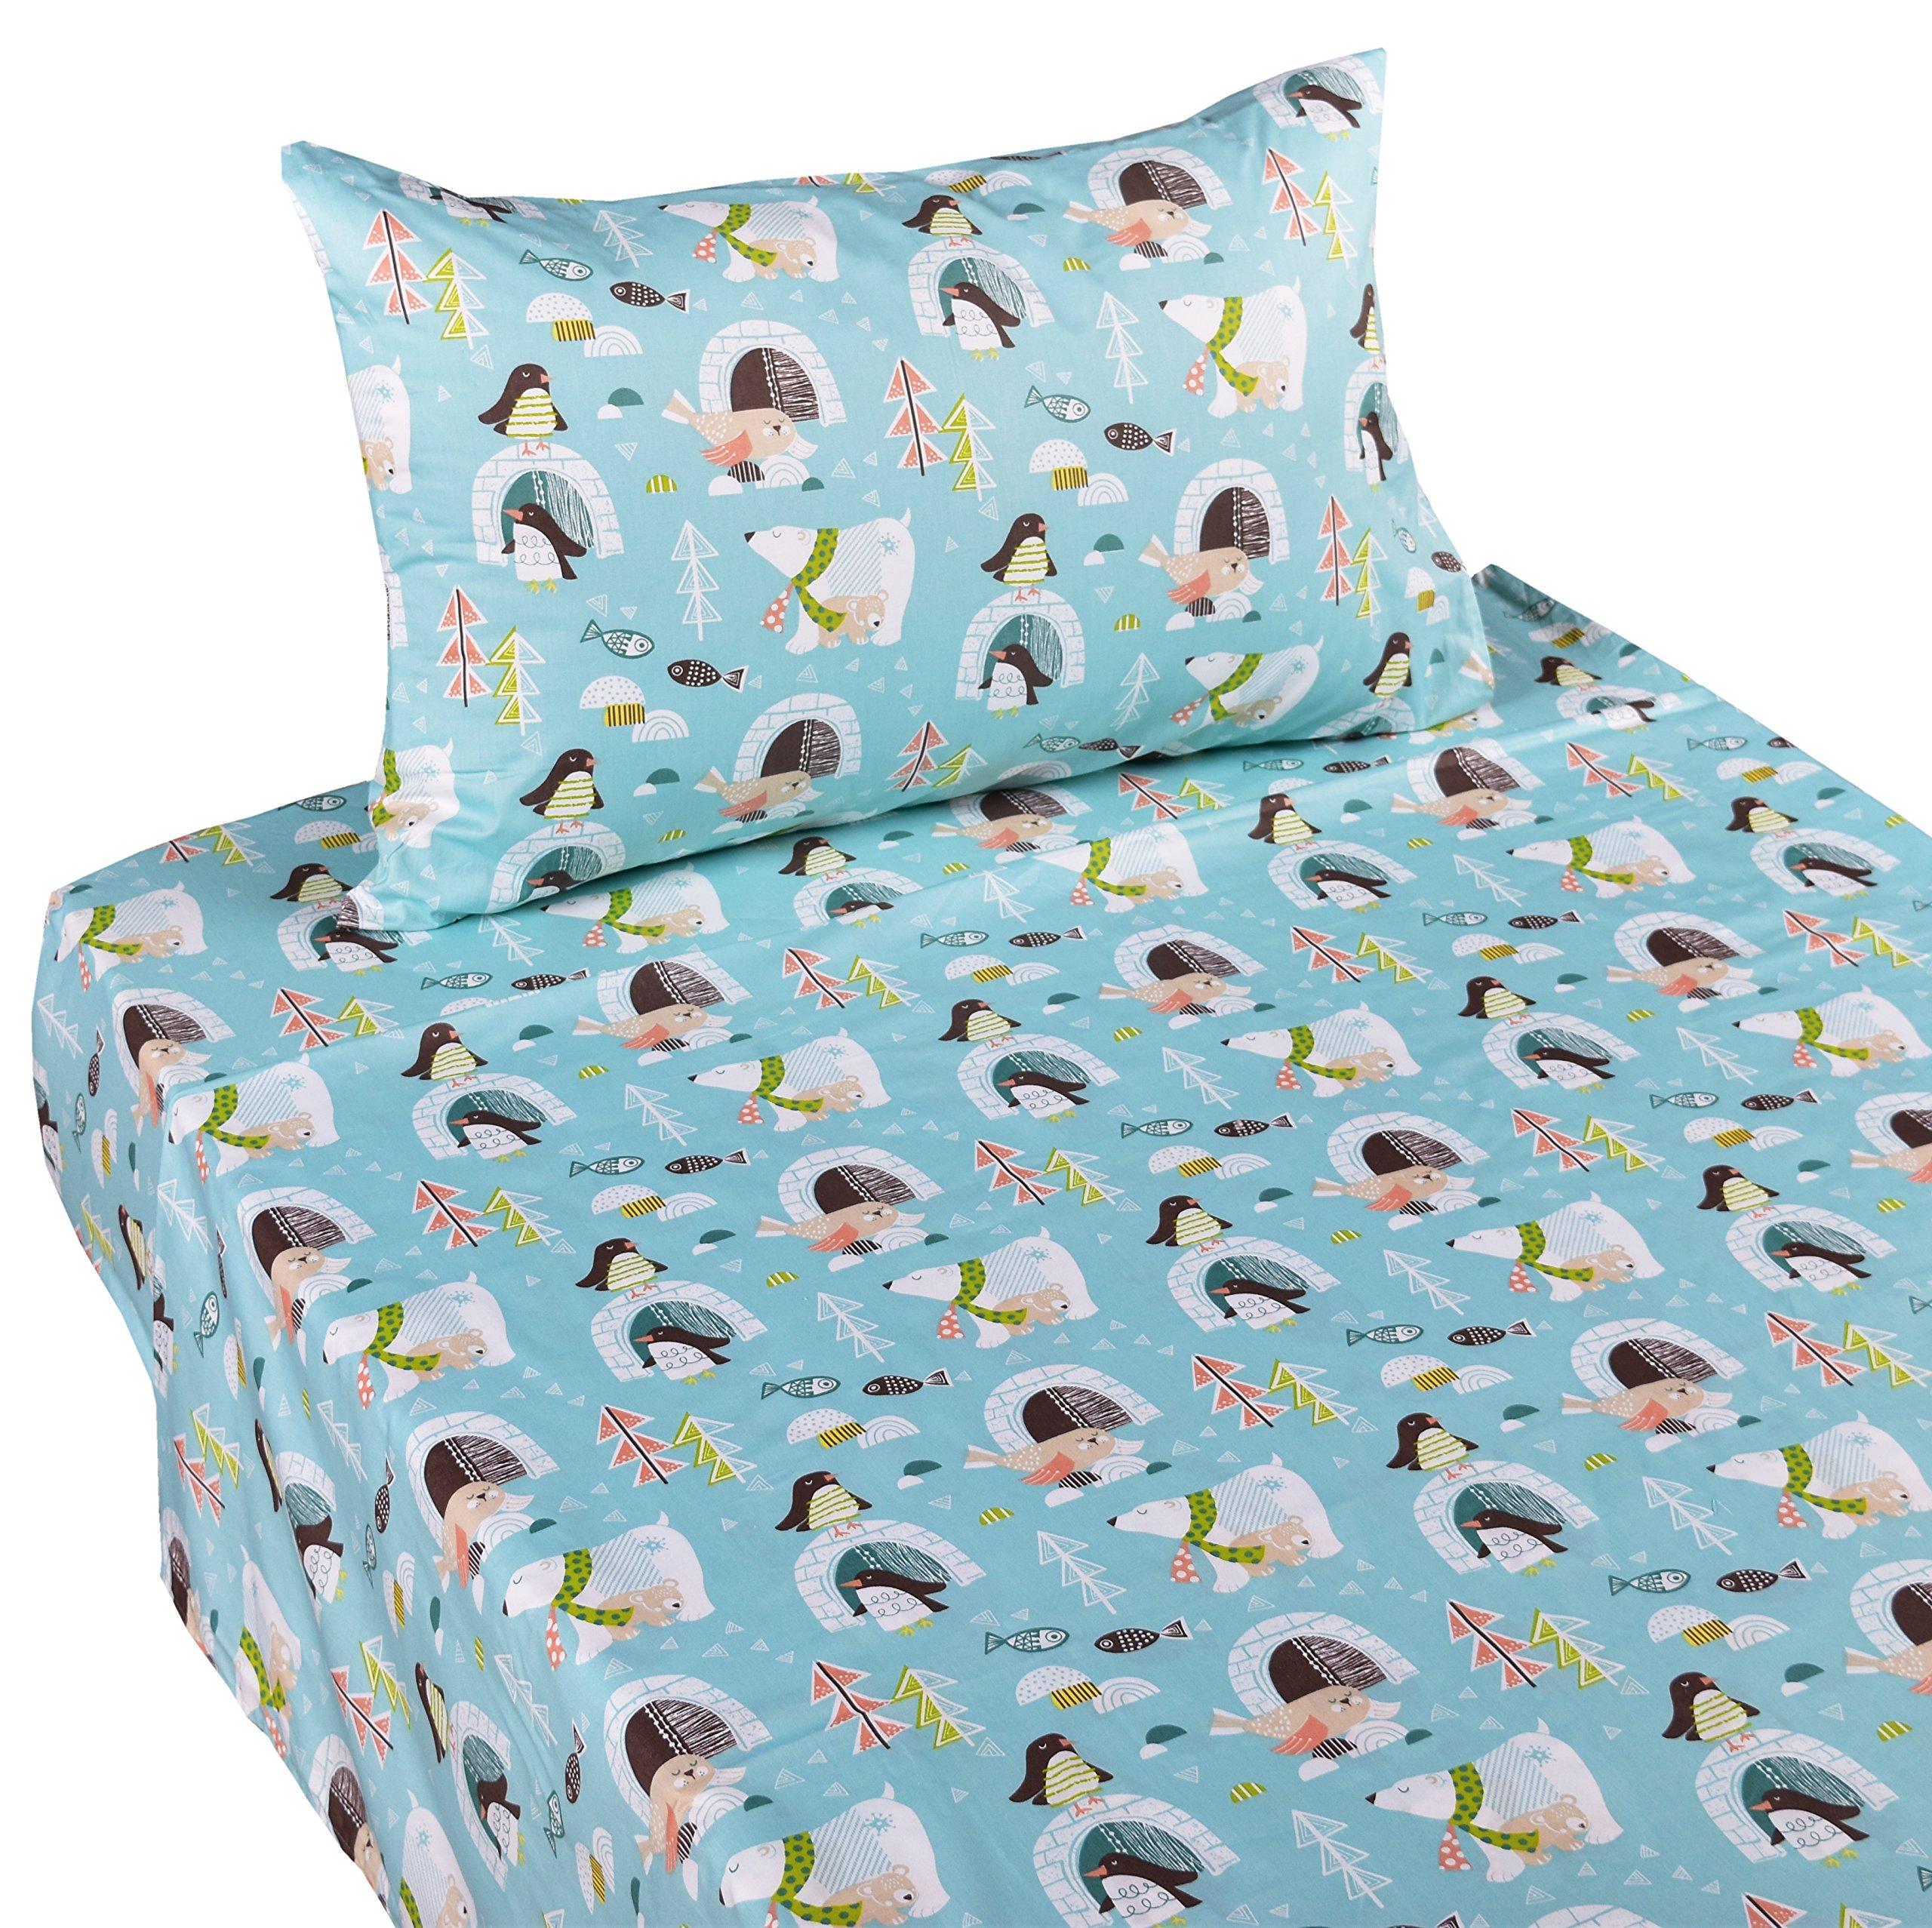 J-pinno Penguin Polar Bear Sea Lion Twin Sheet Set for Kids Boy Children,100% Cotton, Flat Sheet + Fitted Sheet + Pillowcase Bedding Set